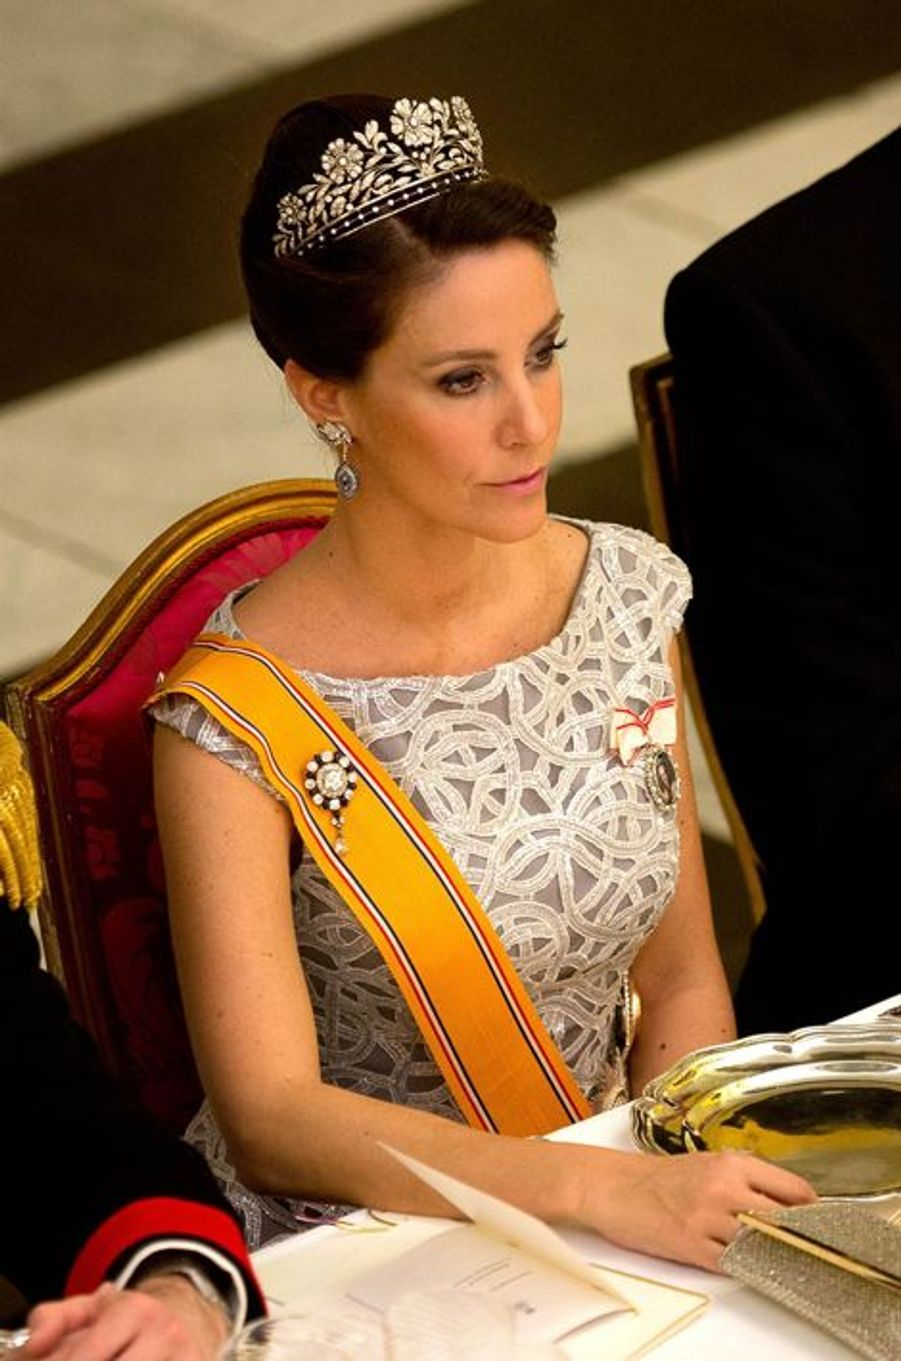 La princesse Marie de Danemark, le 17 mars 2015